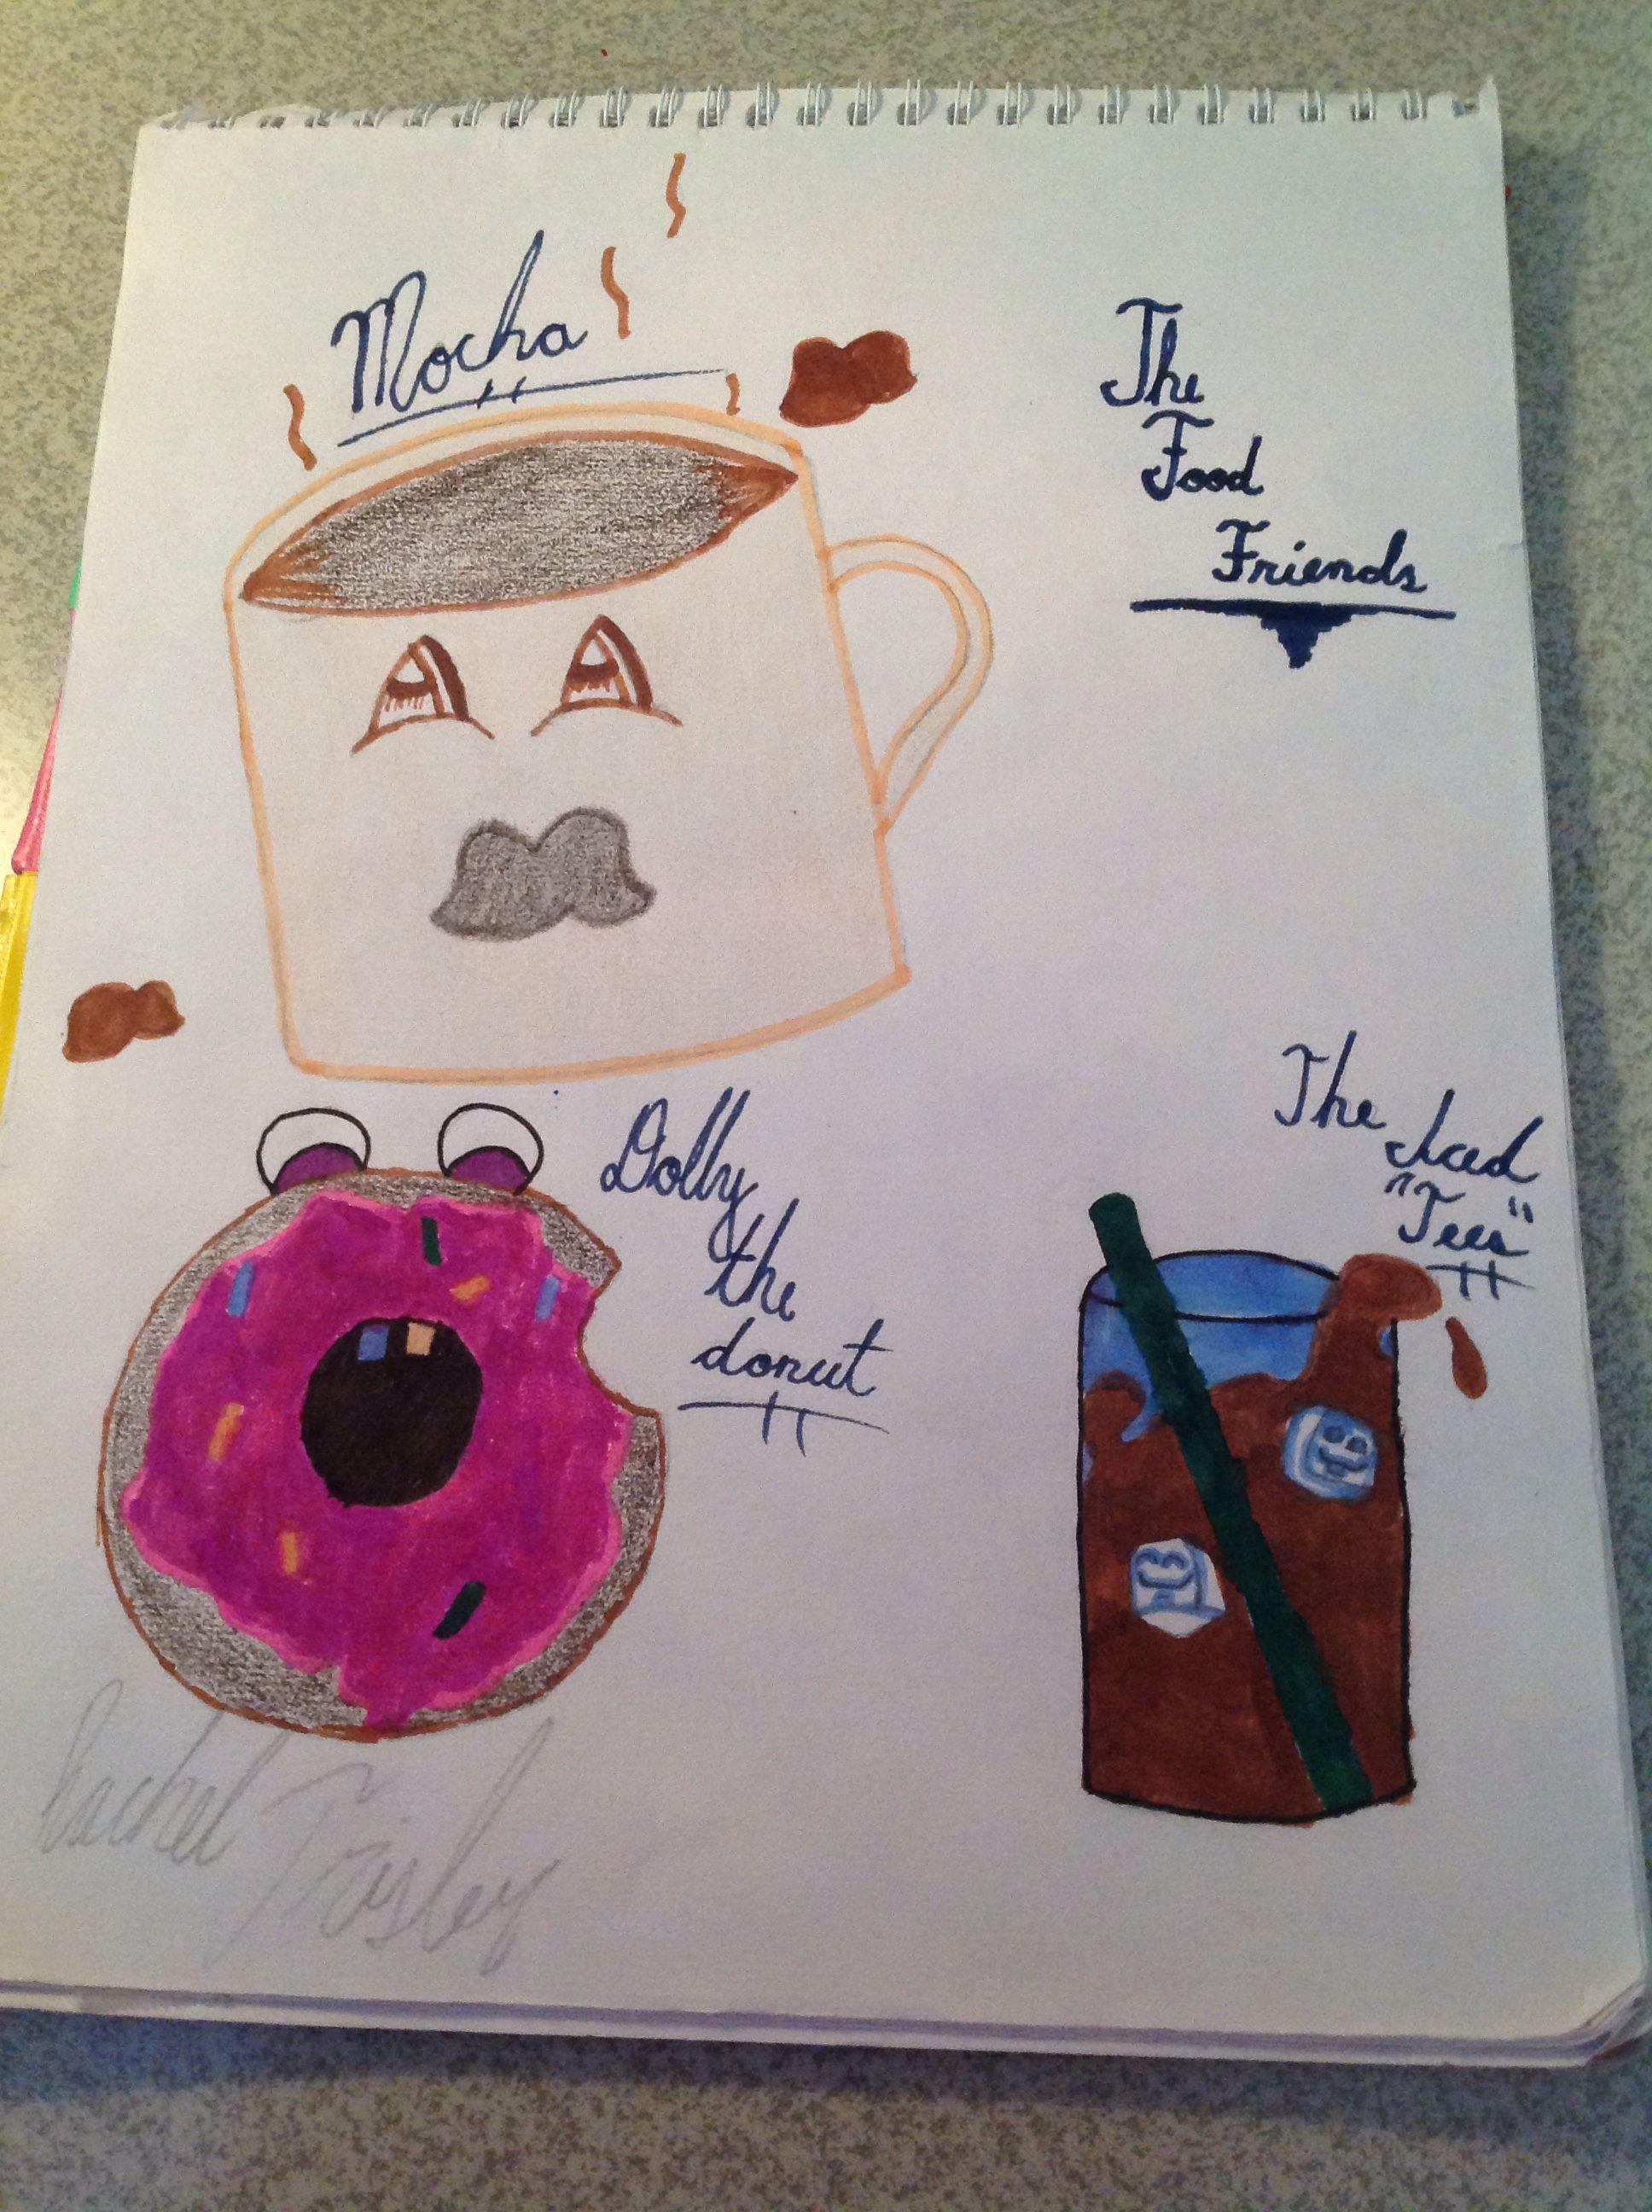 The food friends! -Racheltwizzler